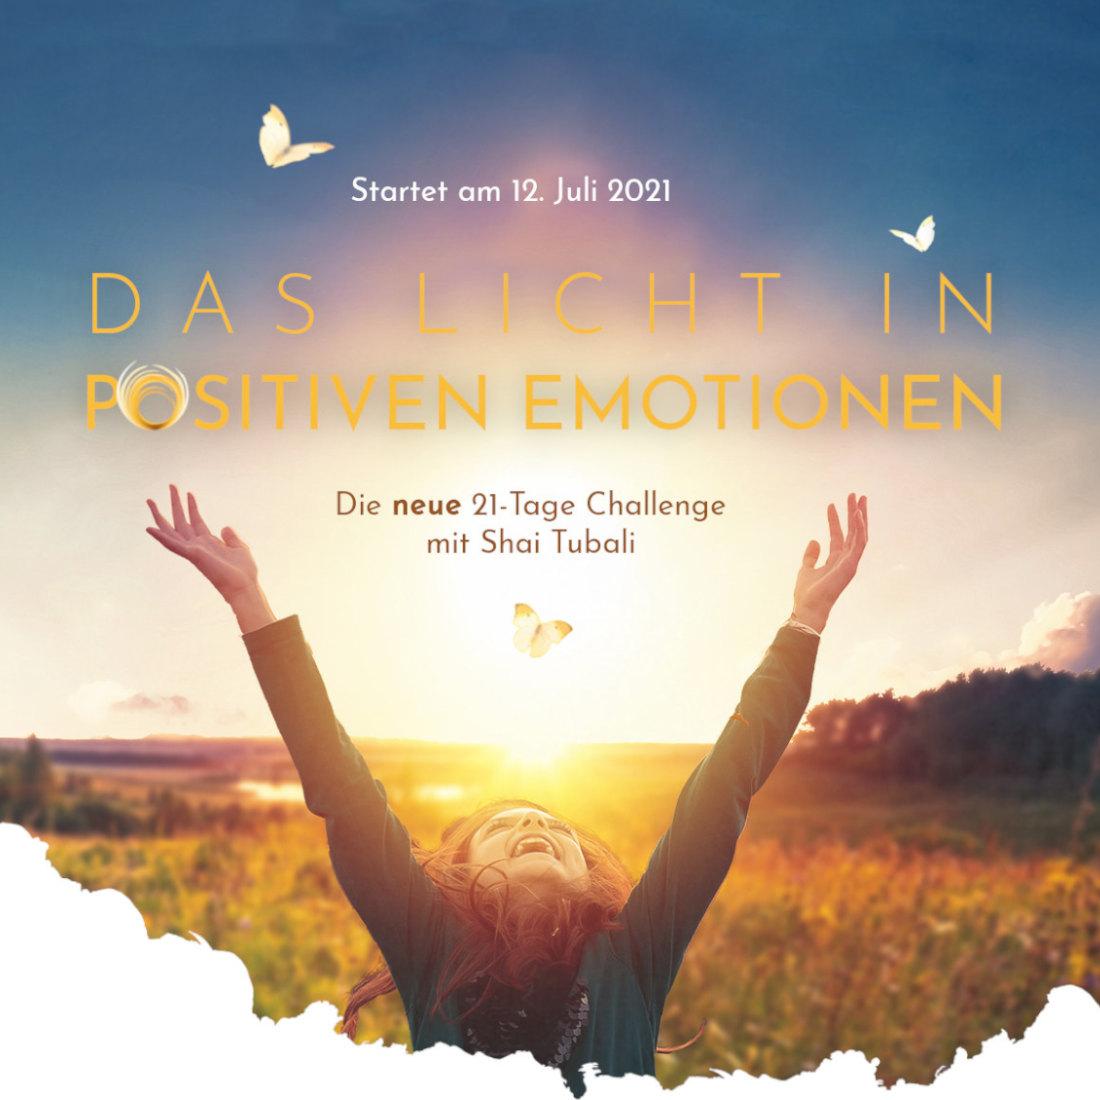 21 Tage Challenge mit Shai Tubali